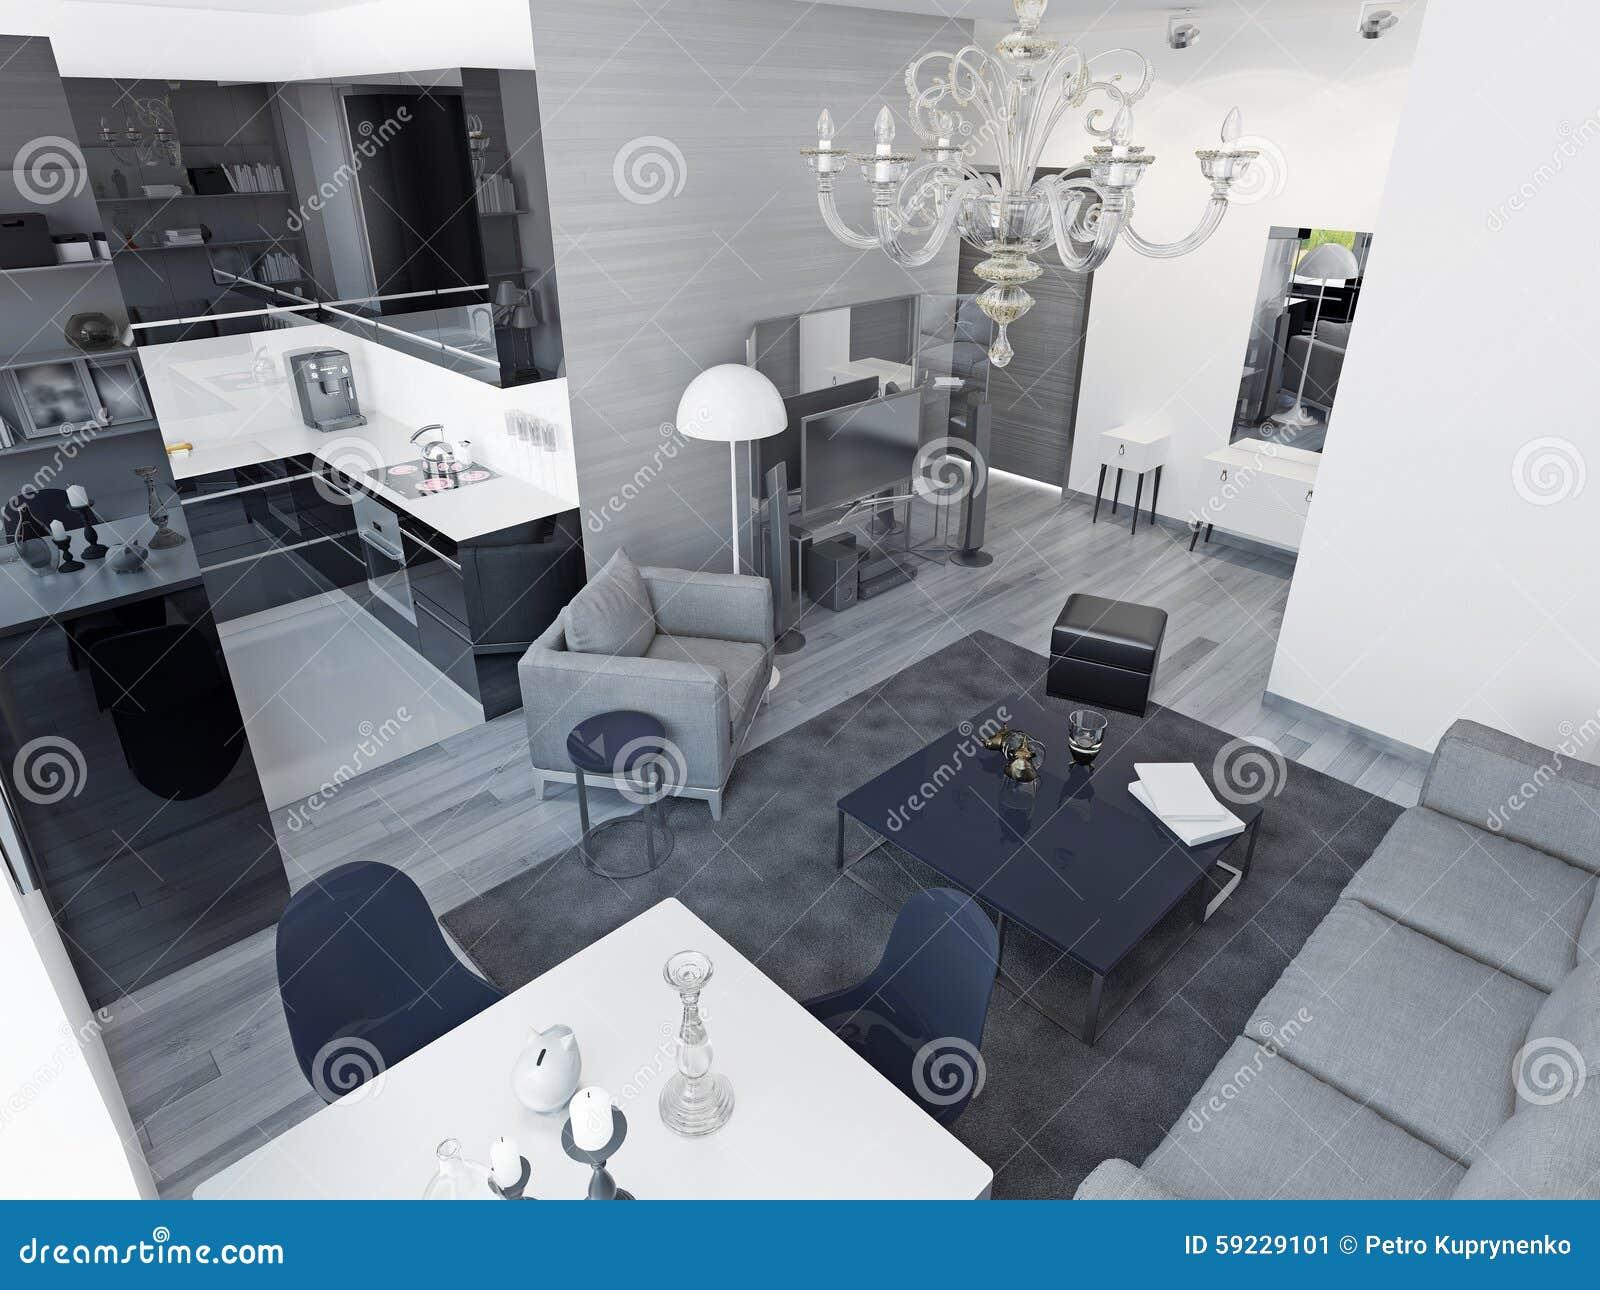 Art deco studio apartments stock illustration. illustration of